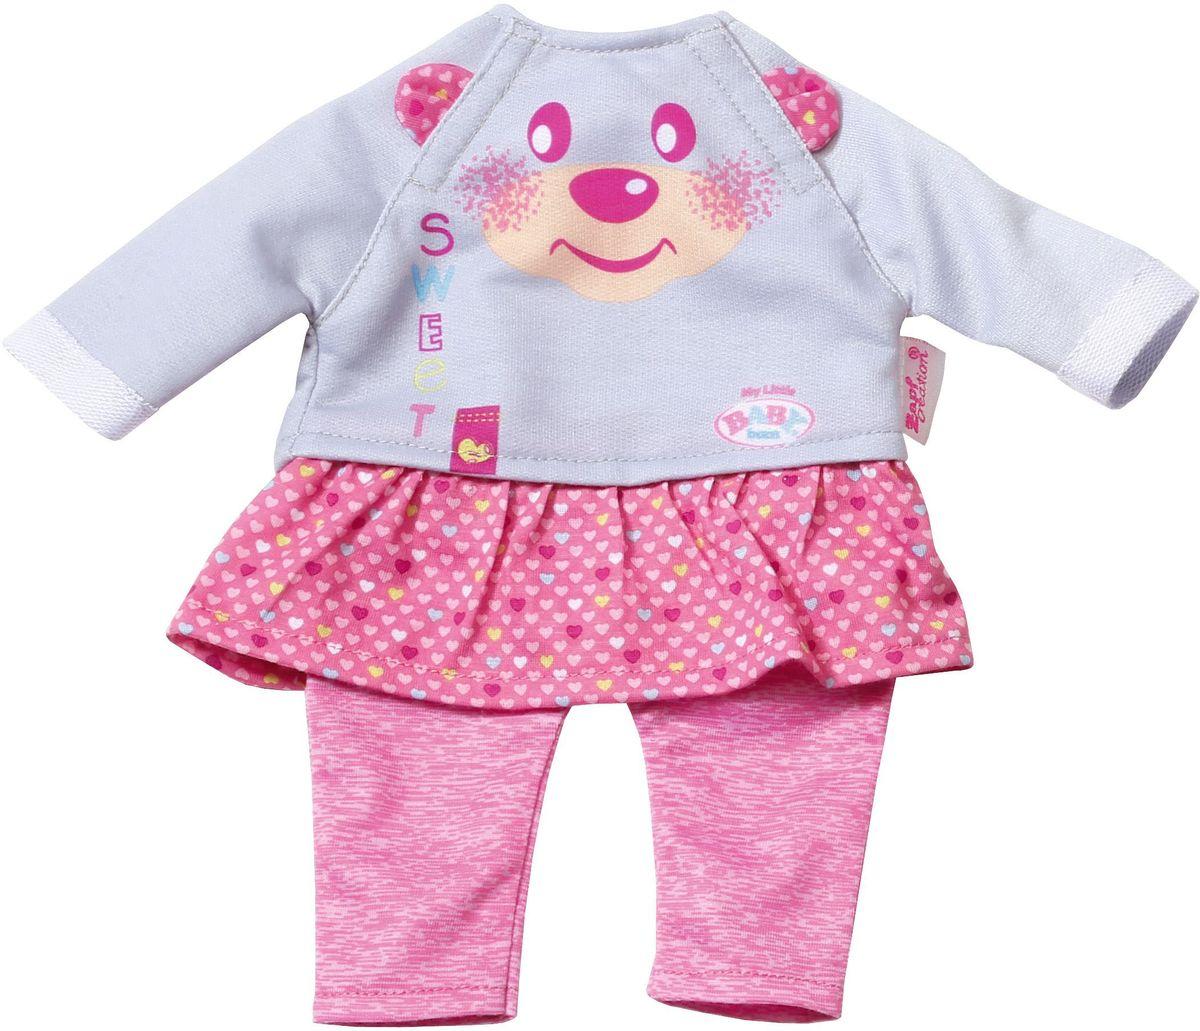 Baby Born Домашний комбинезон для куклы baby born ботиночки для кукол цвет голубой белый оранжевый 2 пары